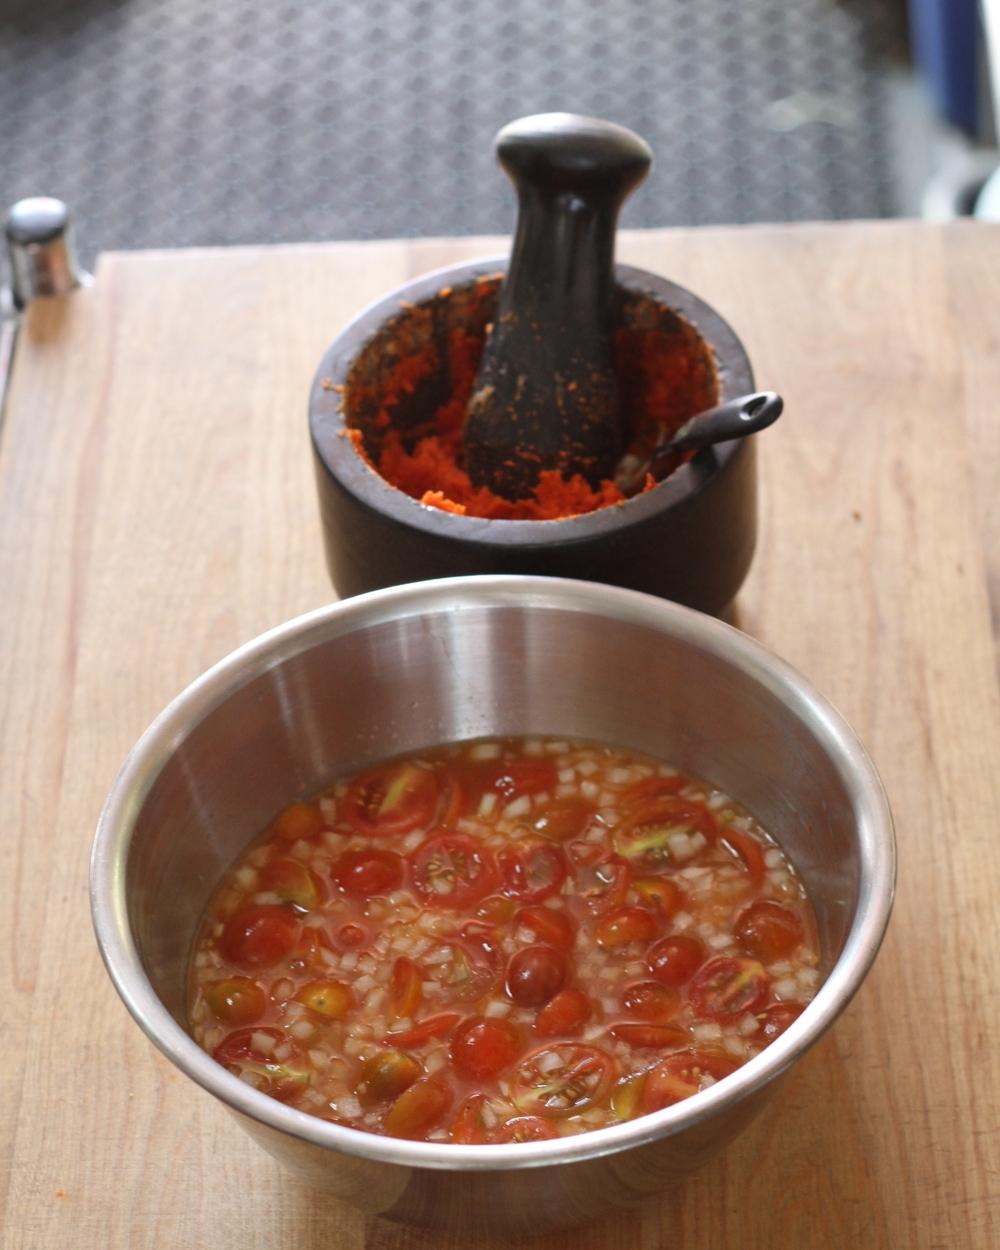 Sauce for the kelaguen guihan